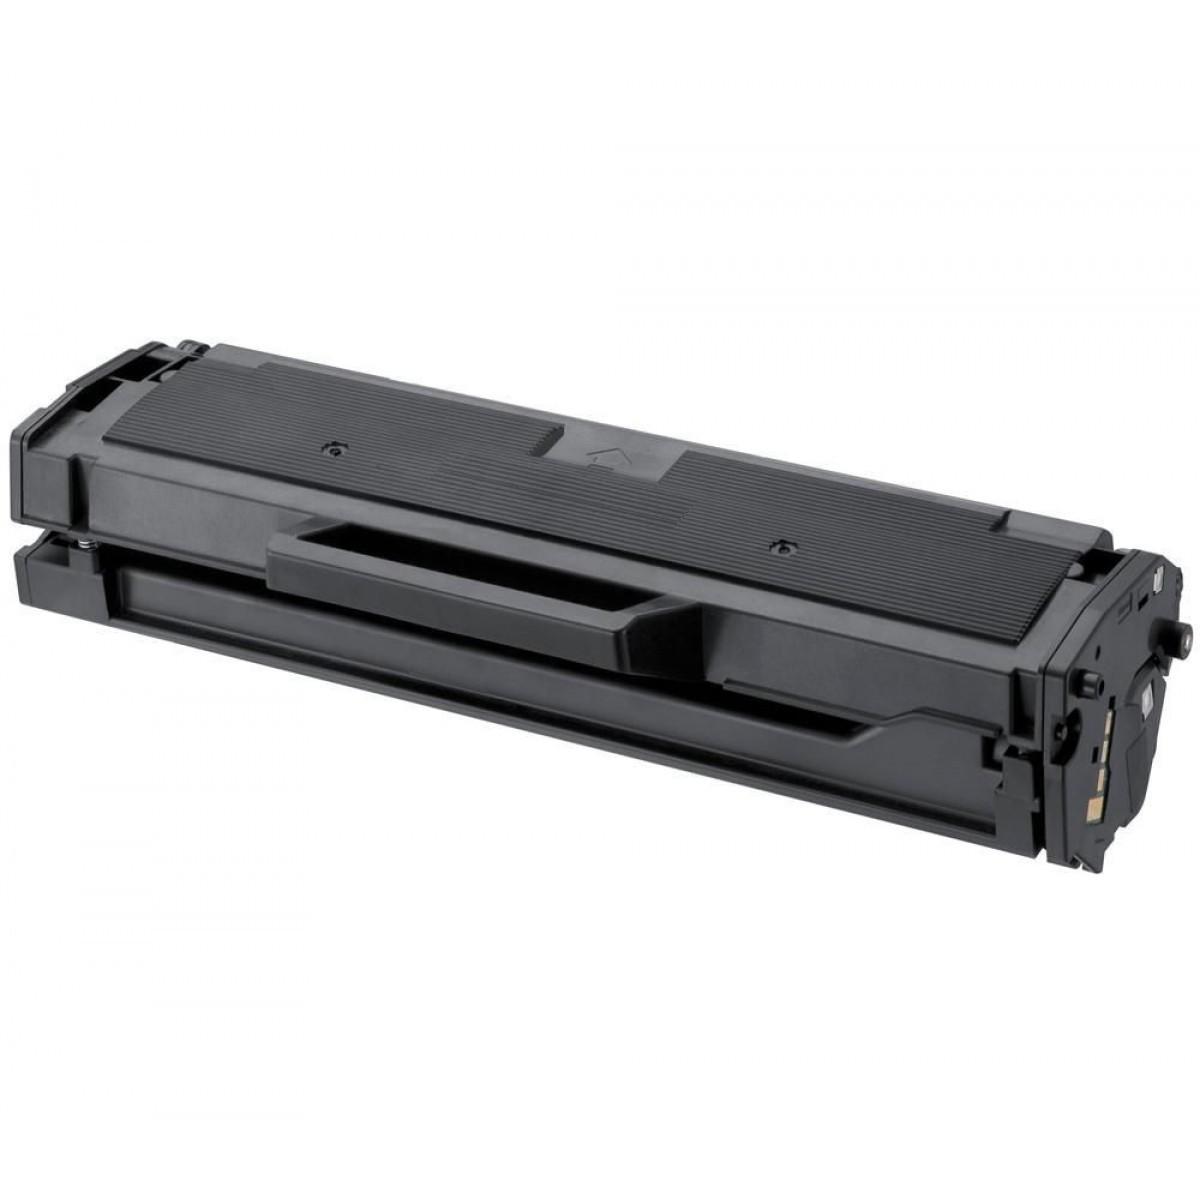 CARTUCHO  TONER SAMSUNG D101 / SCX3405/ ML 2165 / SCX3400 / SCX3401